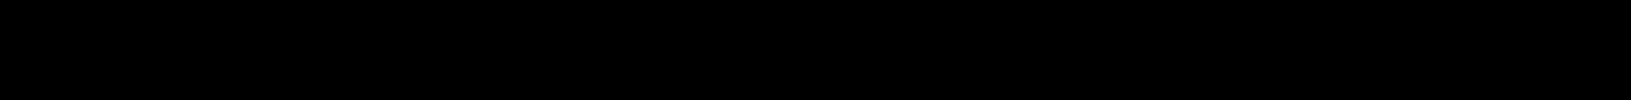 Namenszug (Bild)